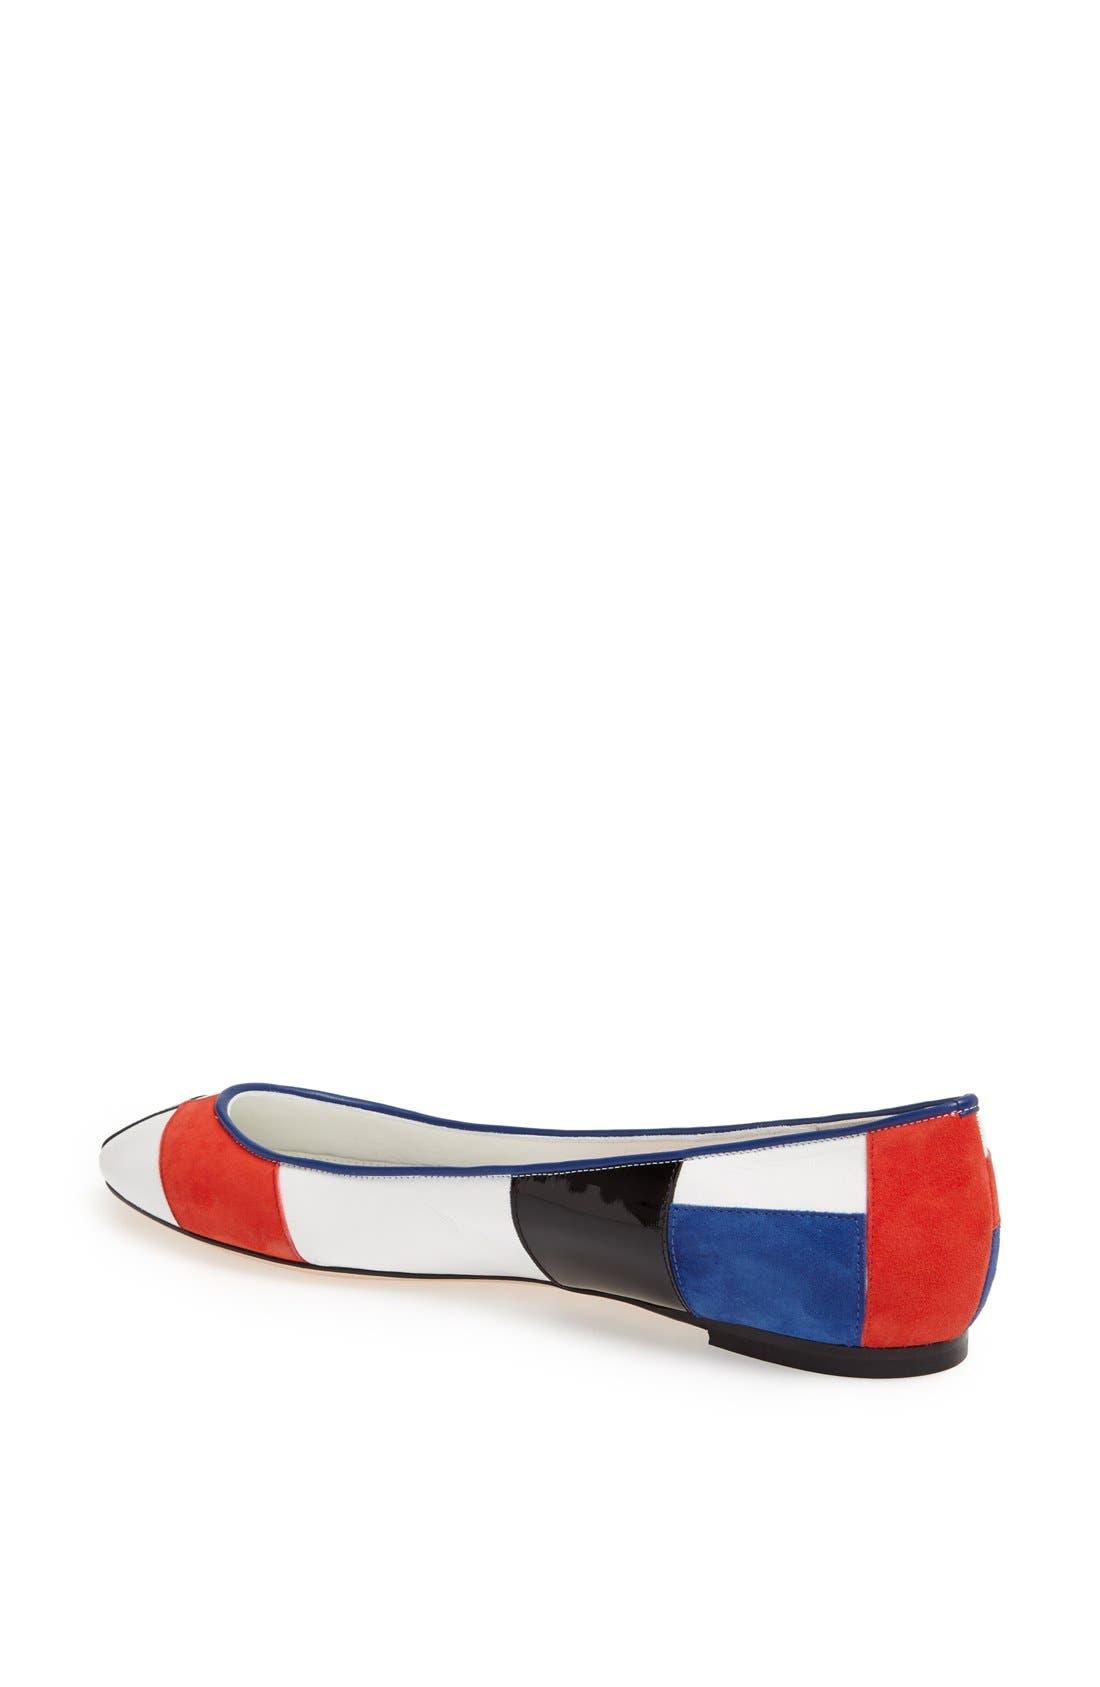 Alternate Image 2  - Alexander McQueen 'Mondrian' Ballet Flat